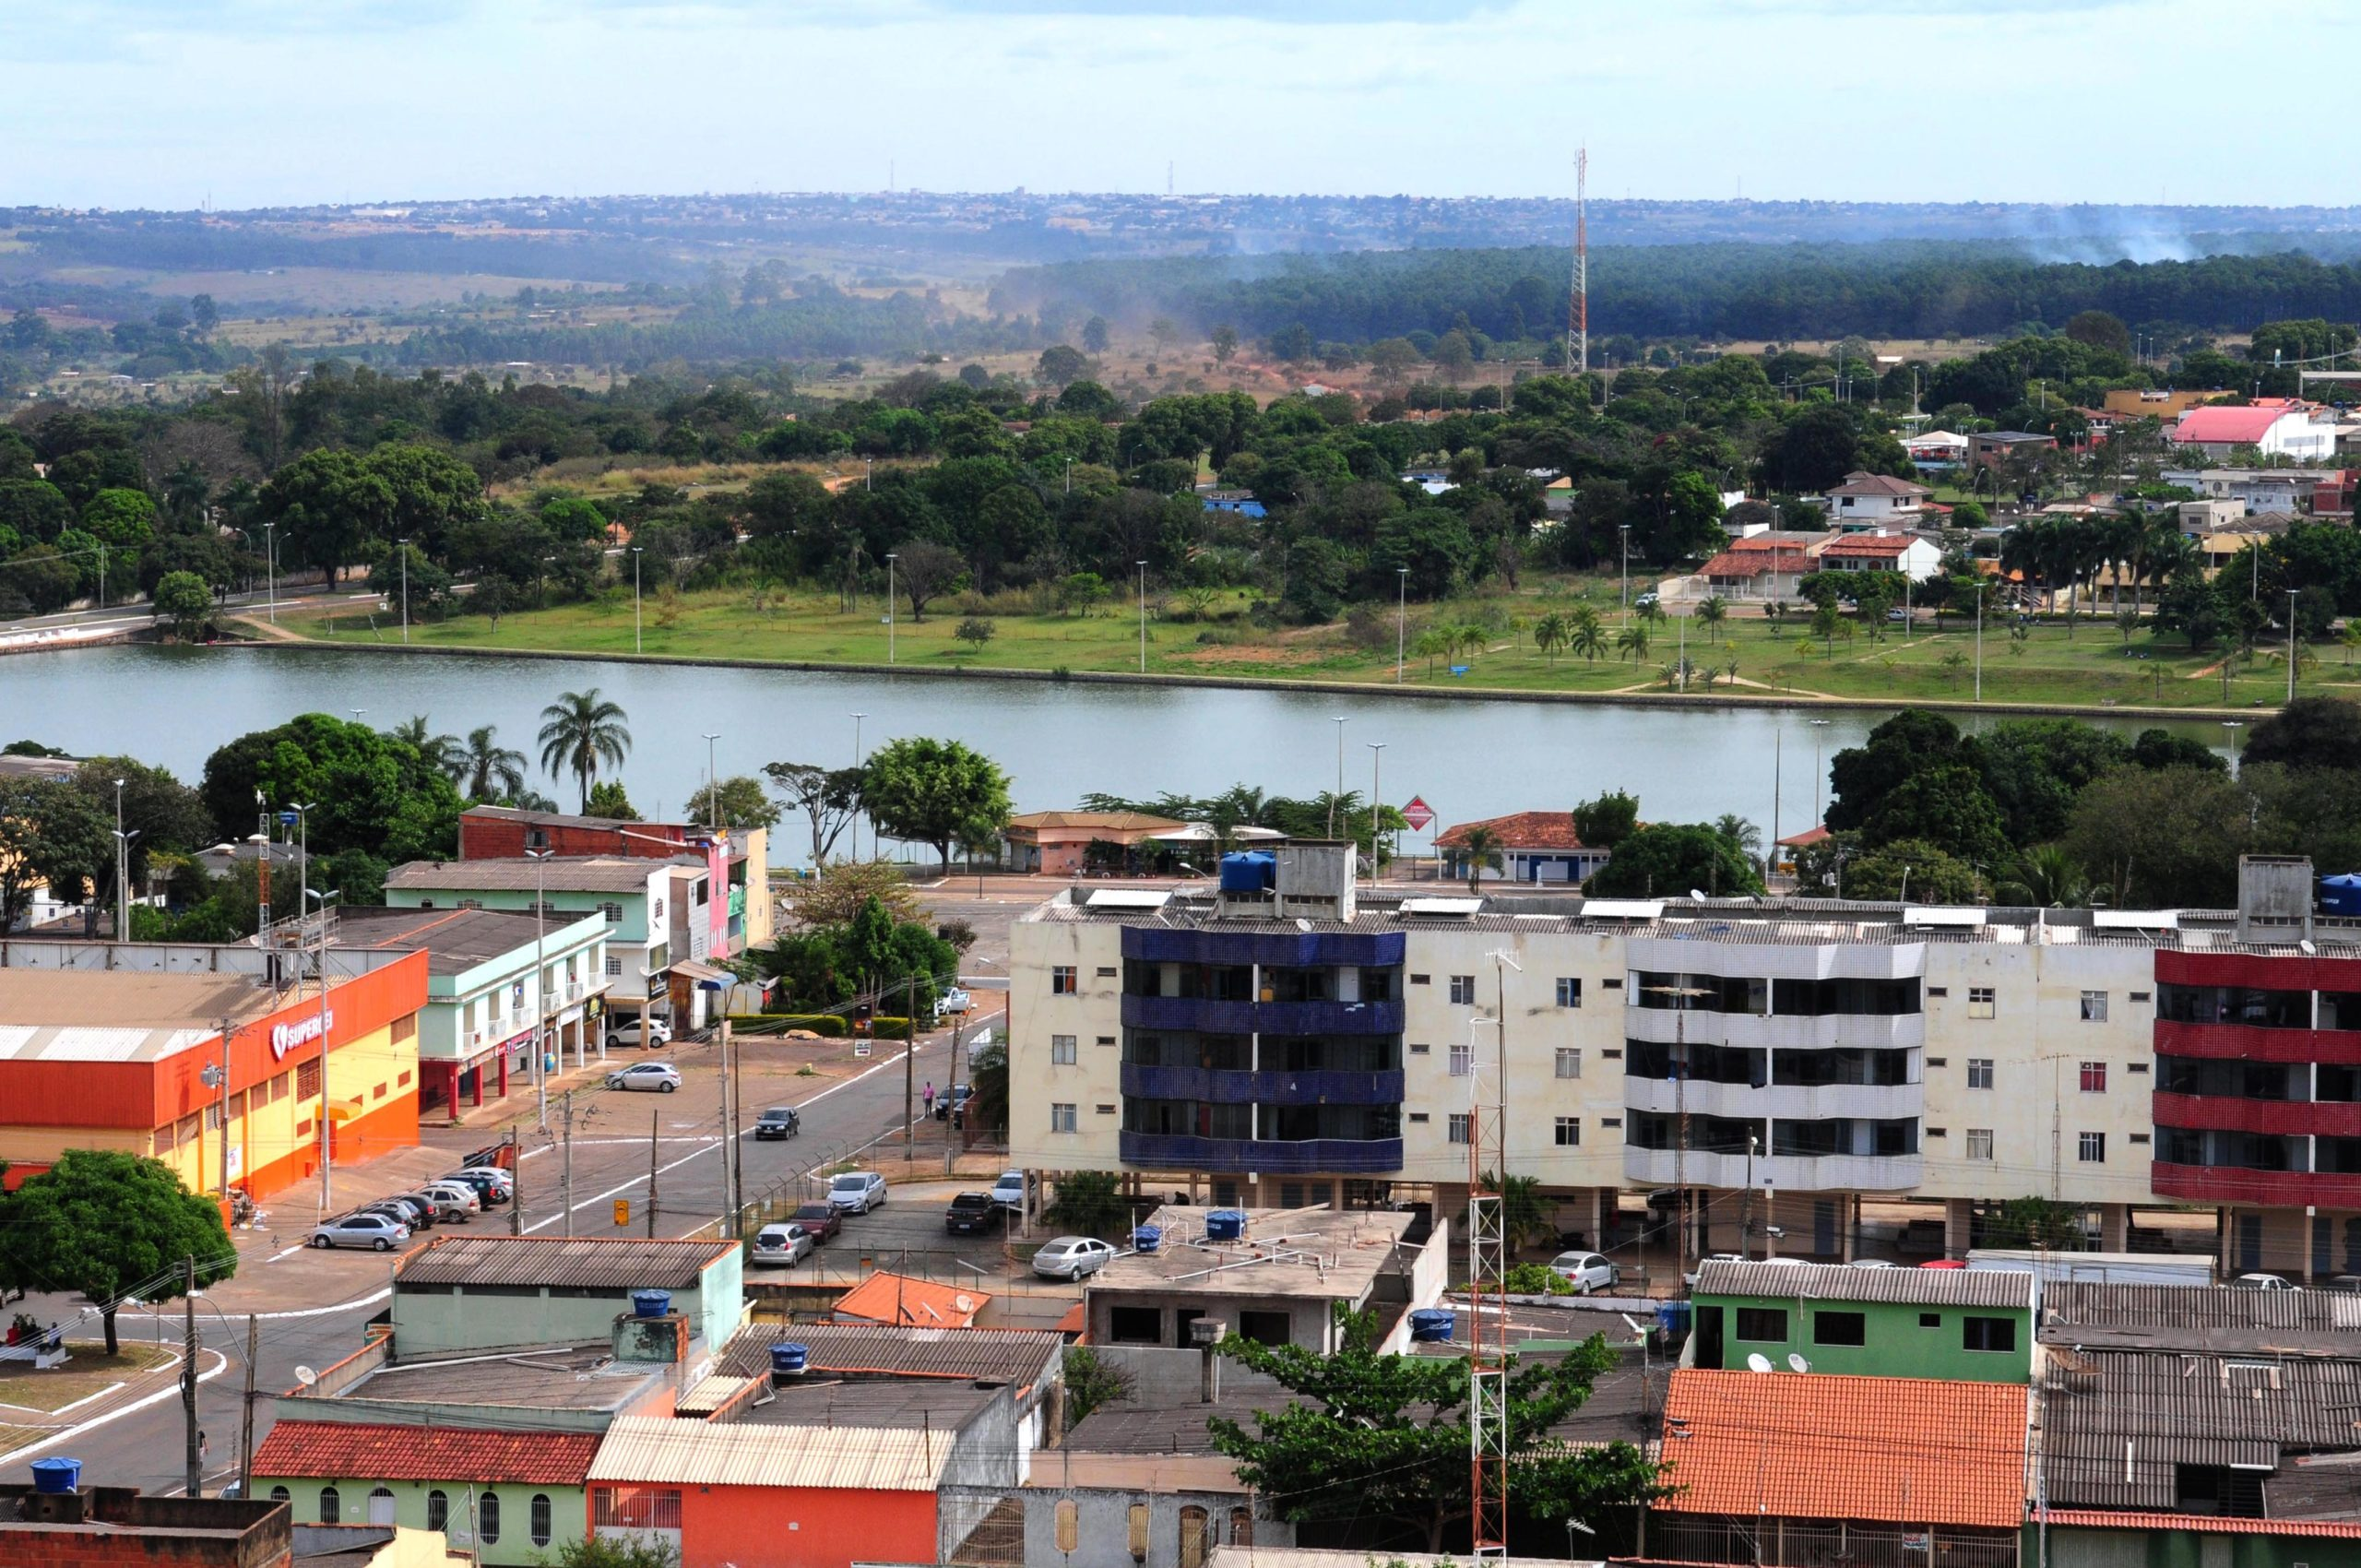 BRAZLÂNDIA SEM ÁGUA | Caesb interrompe fornecimento na terça (19), das 8h às 23h55